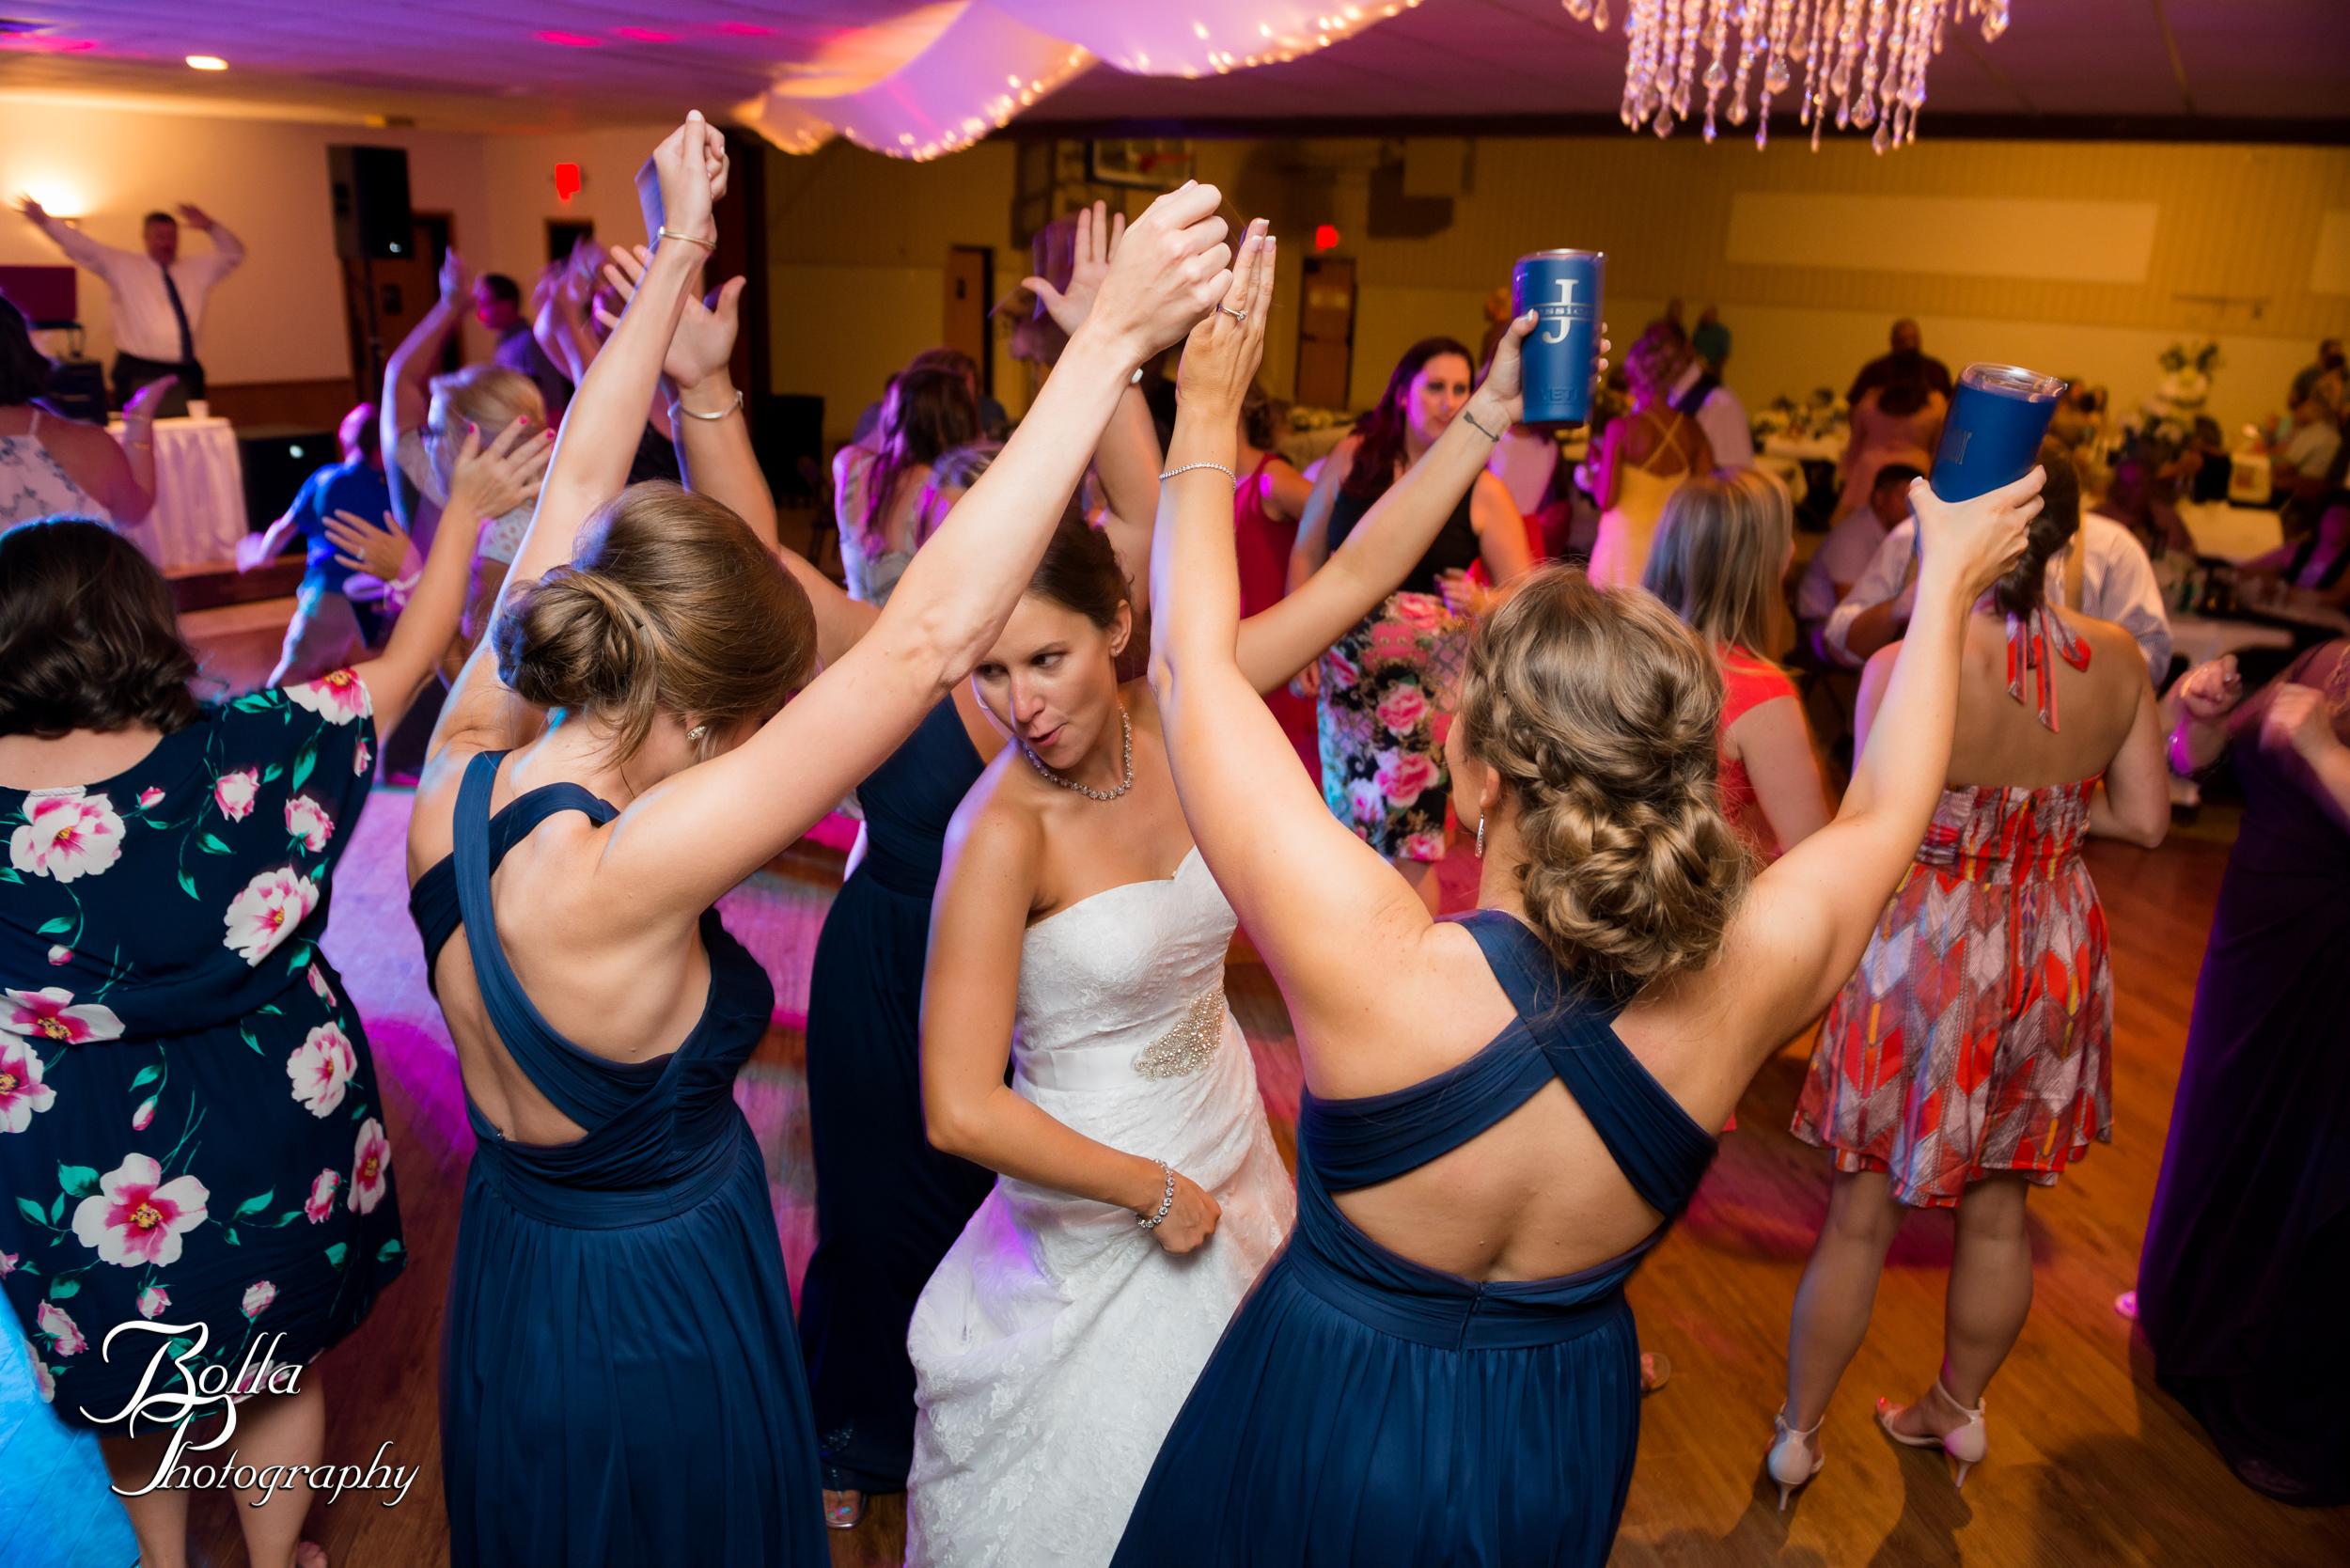 Bolla_photography_edwardsville_wedding_photographer_st_louis_weddings_Jessica_Barbachem_Dillon_Kaesberg_Waterloo_Red_Bud-0598.jpg